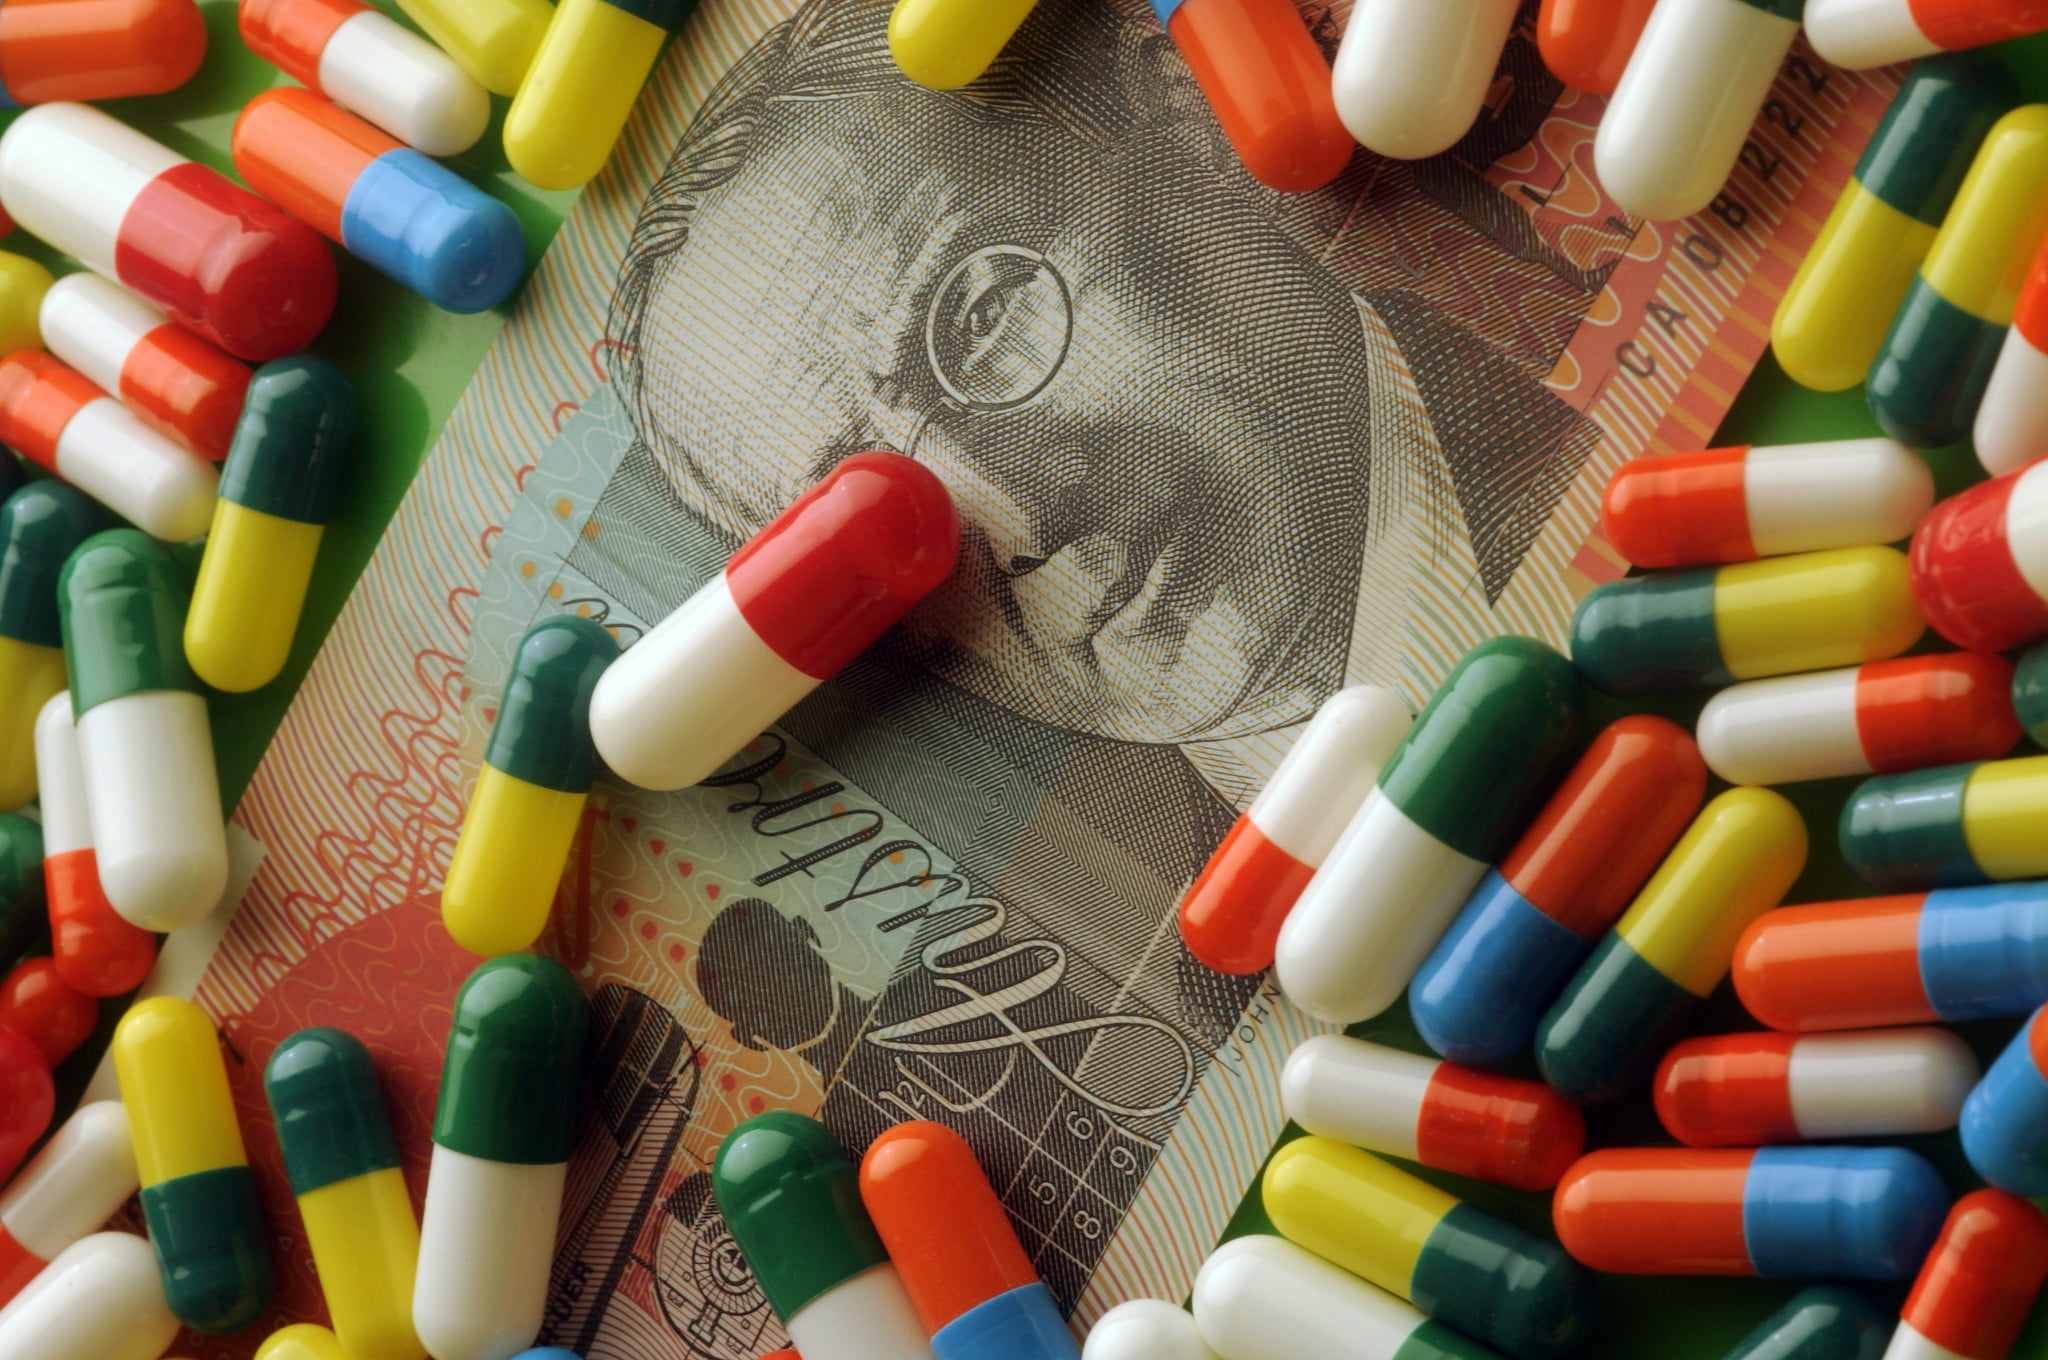 pills on $20 note